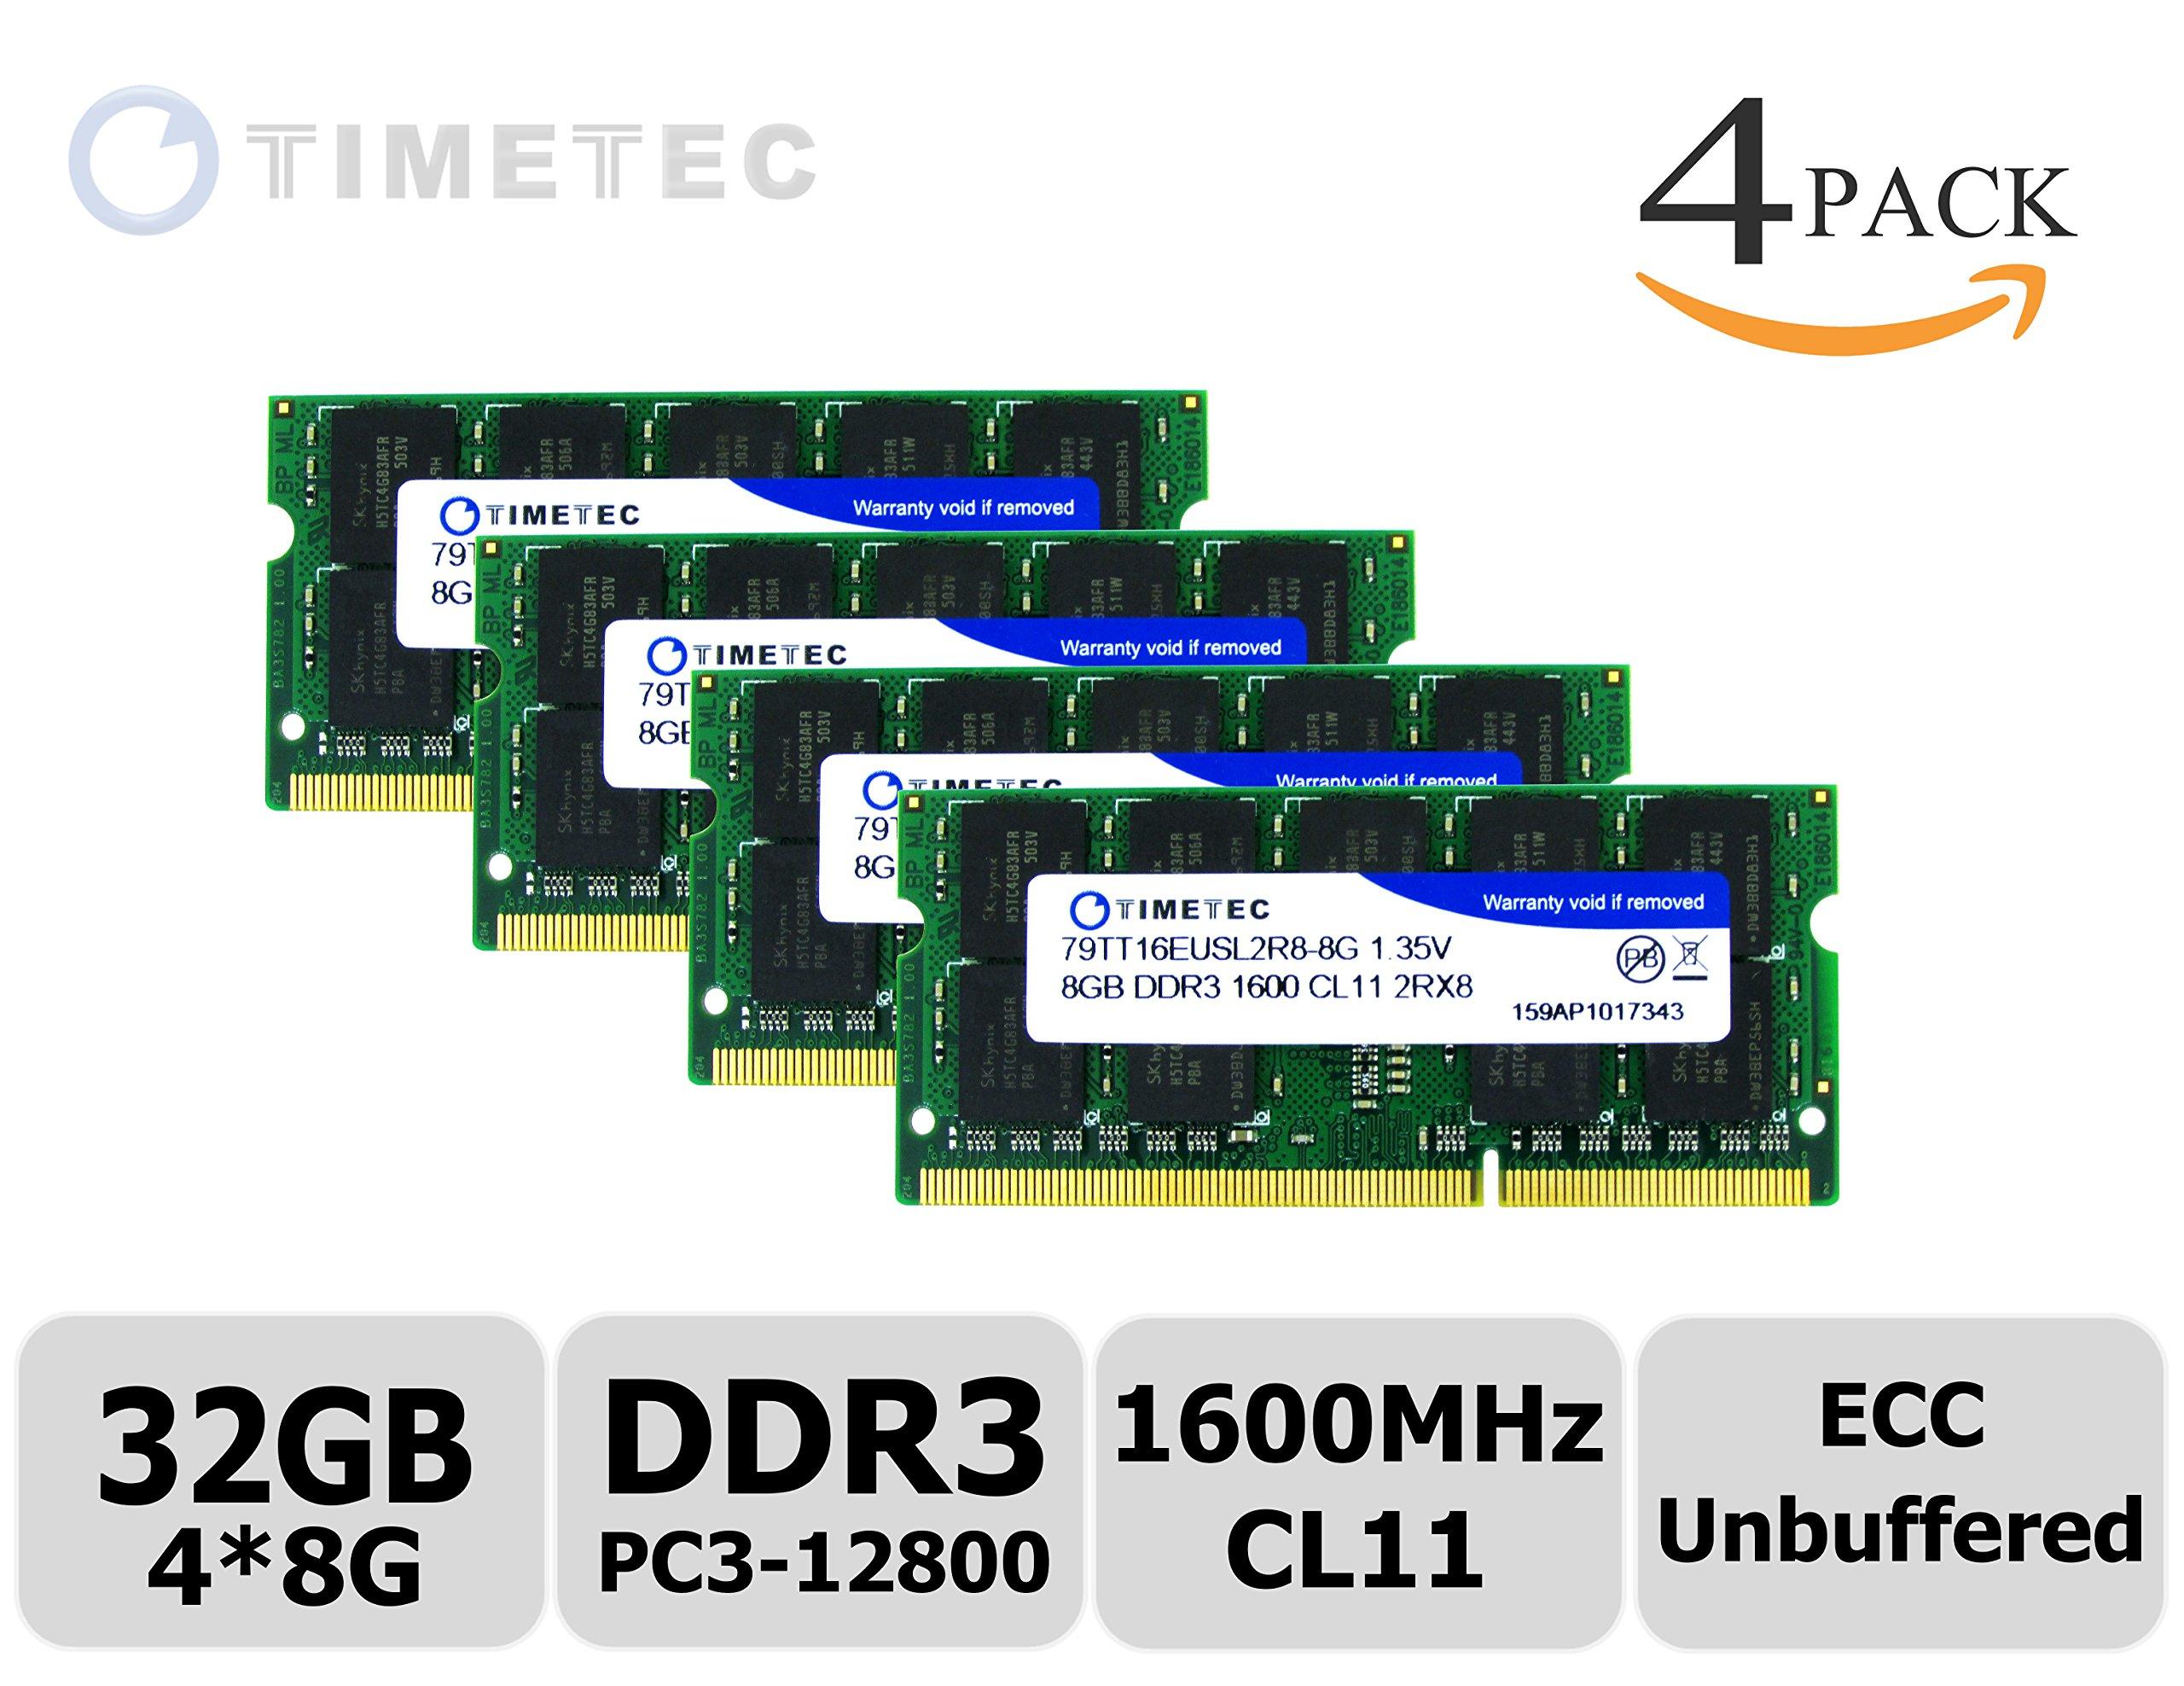 Timetec® (79TT16EUSL2R8-8G) 16GB KIT (2x8GB) DDR3L 1600MHz (PC3-12800) Unbuffered ECC 1.35V CL11 2Rx8 512x8 Dual Rank 204 Pin SODIMM Server Memory Module Upgrade Hynix IC (16GB KIT (2x8GB))